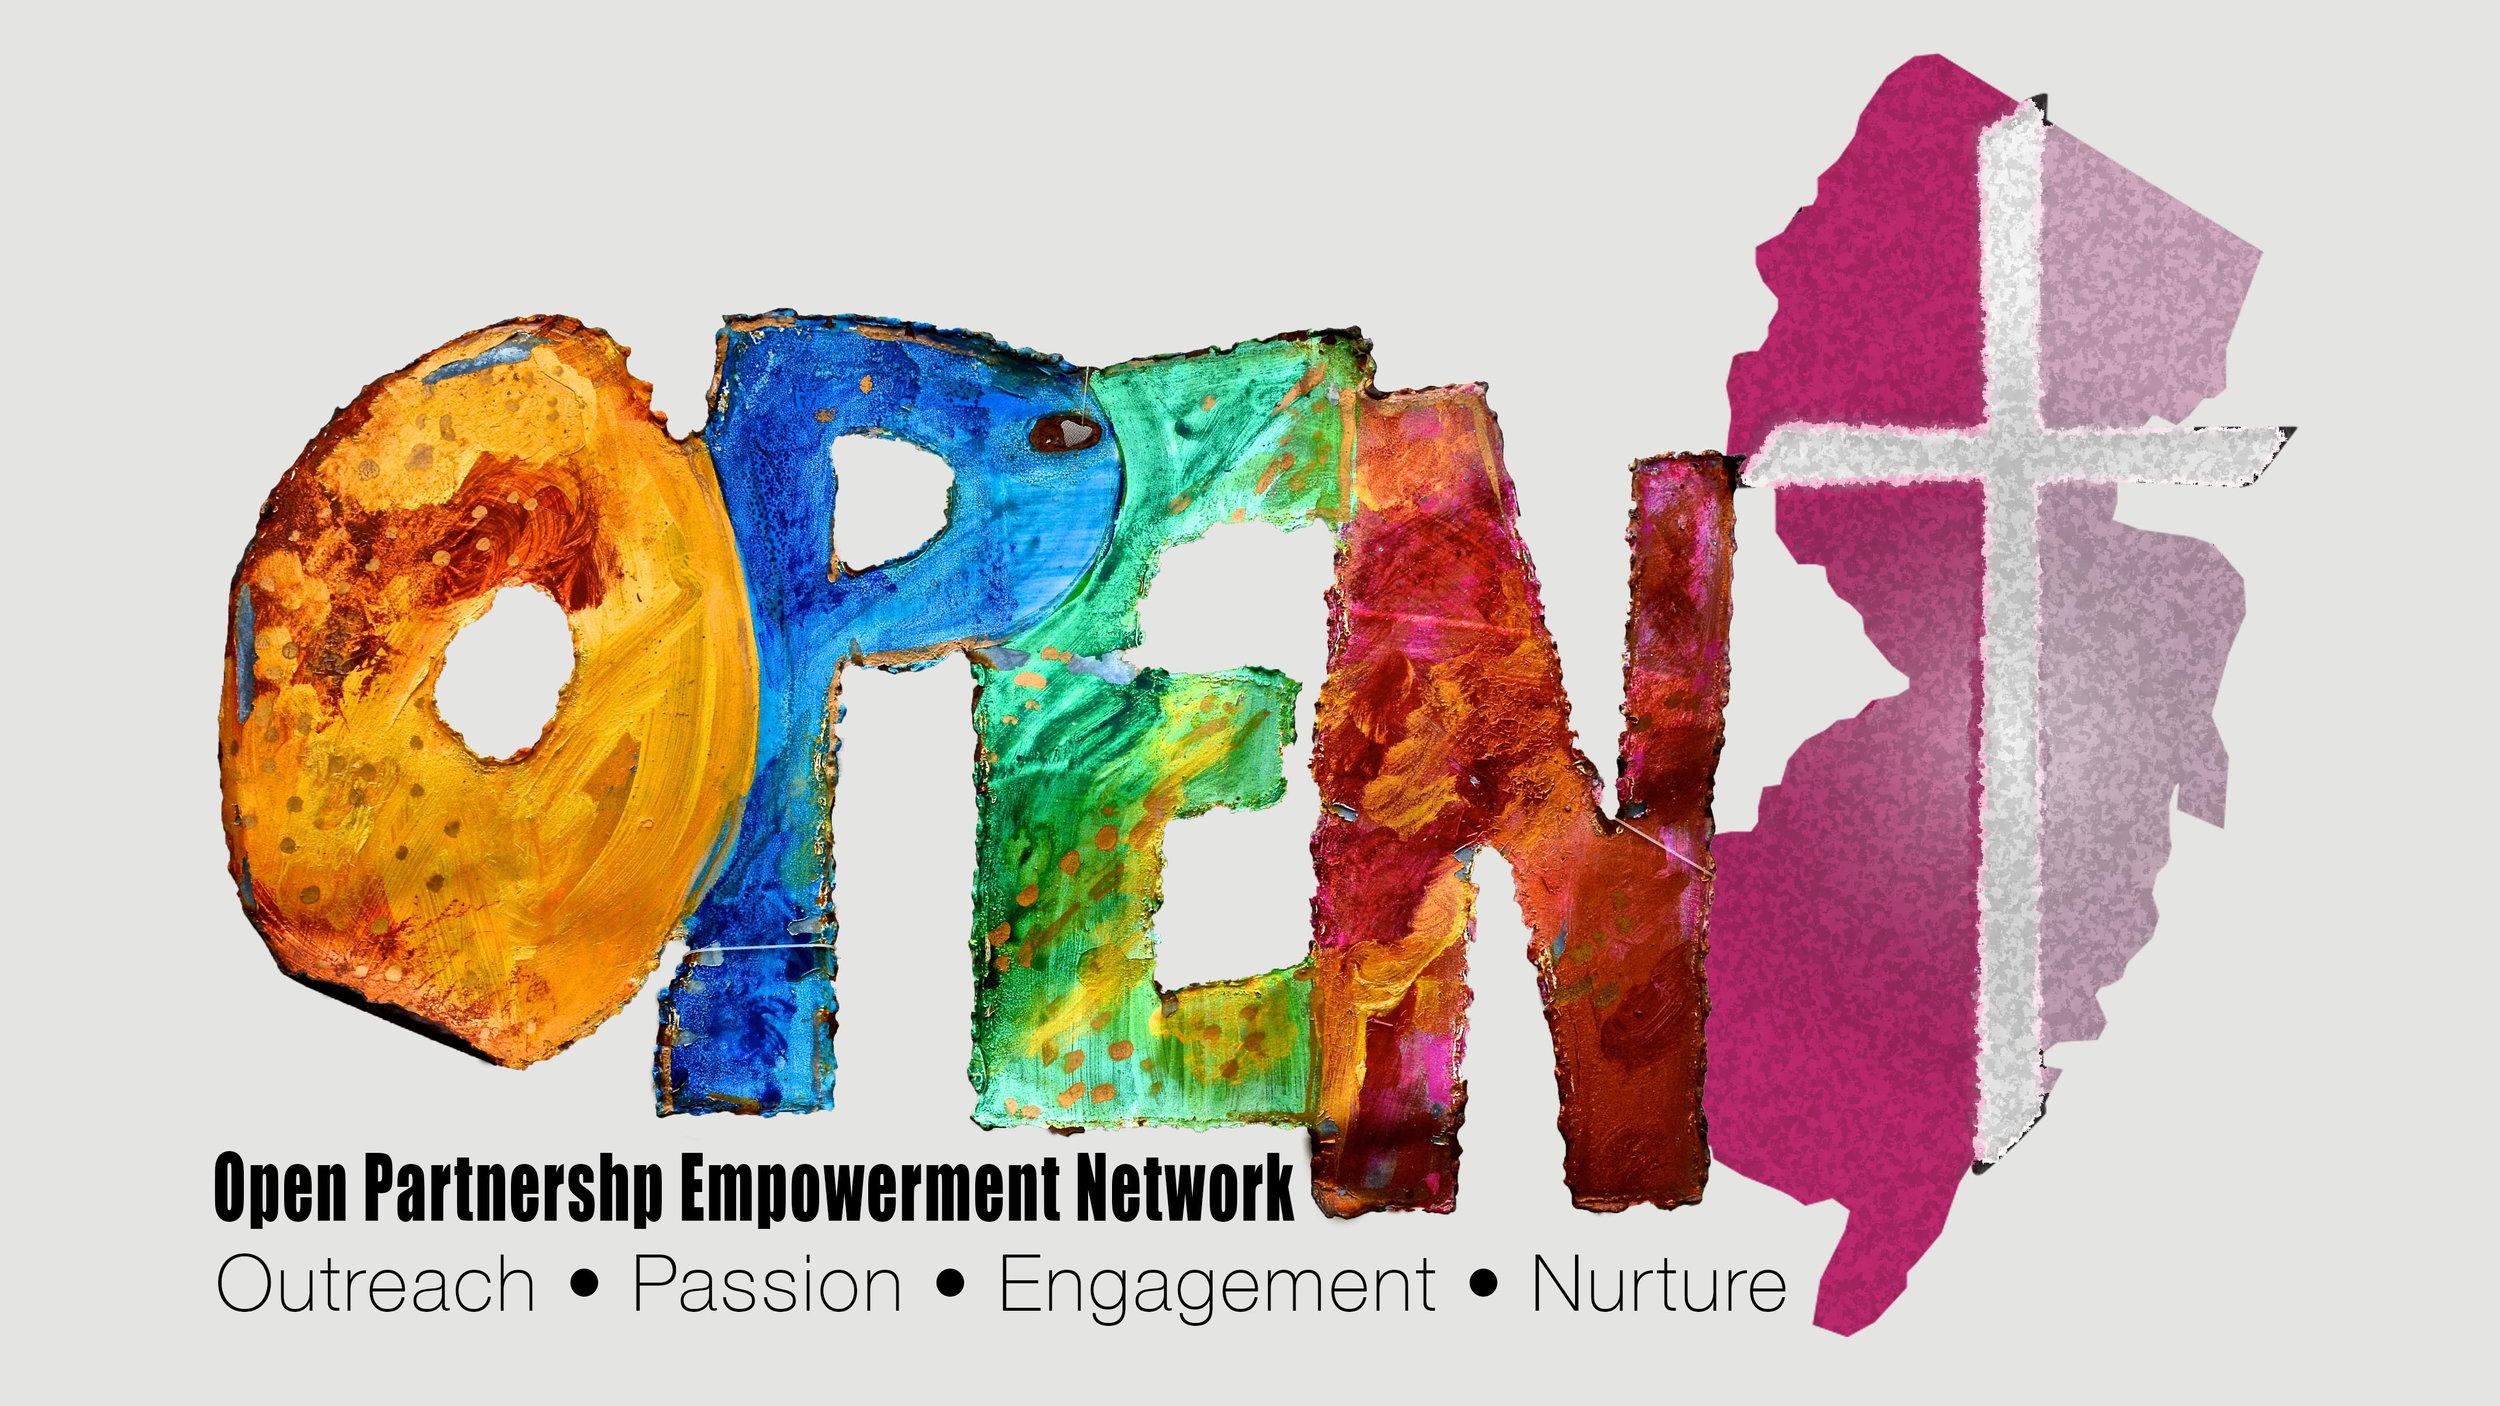 Open Partnership Empowerment Network